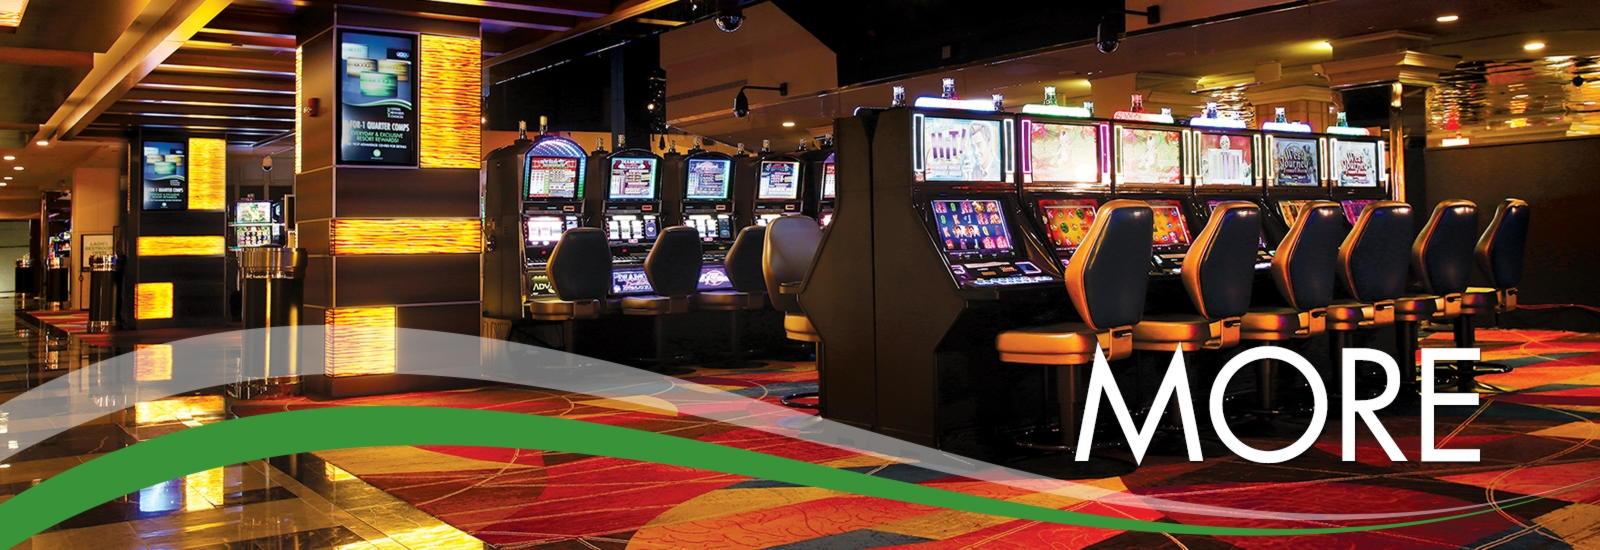 $ 590 FREE Chip at Box 24 Casino